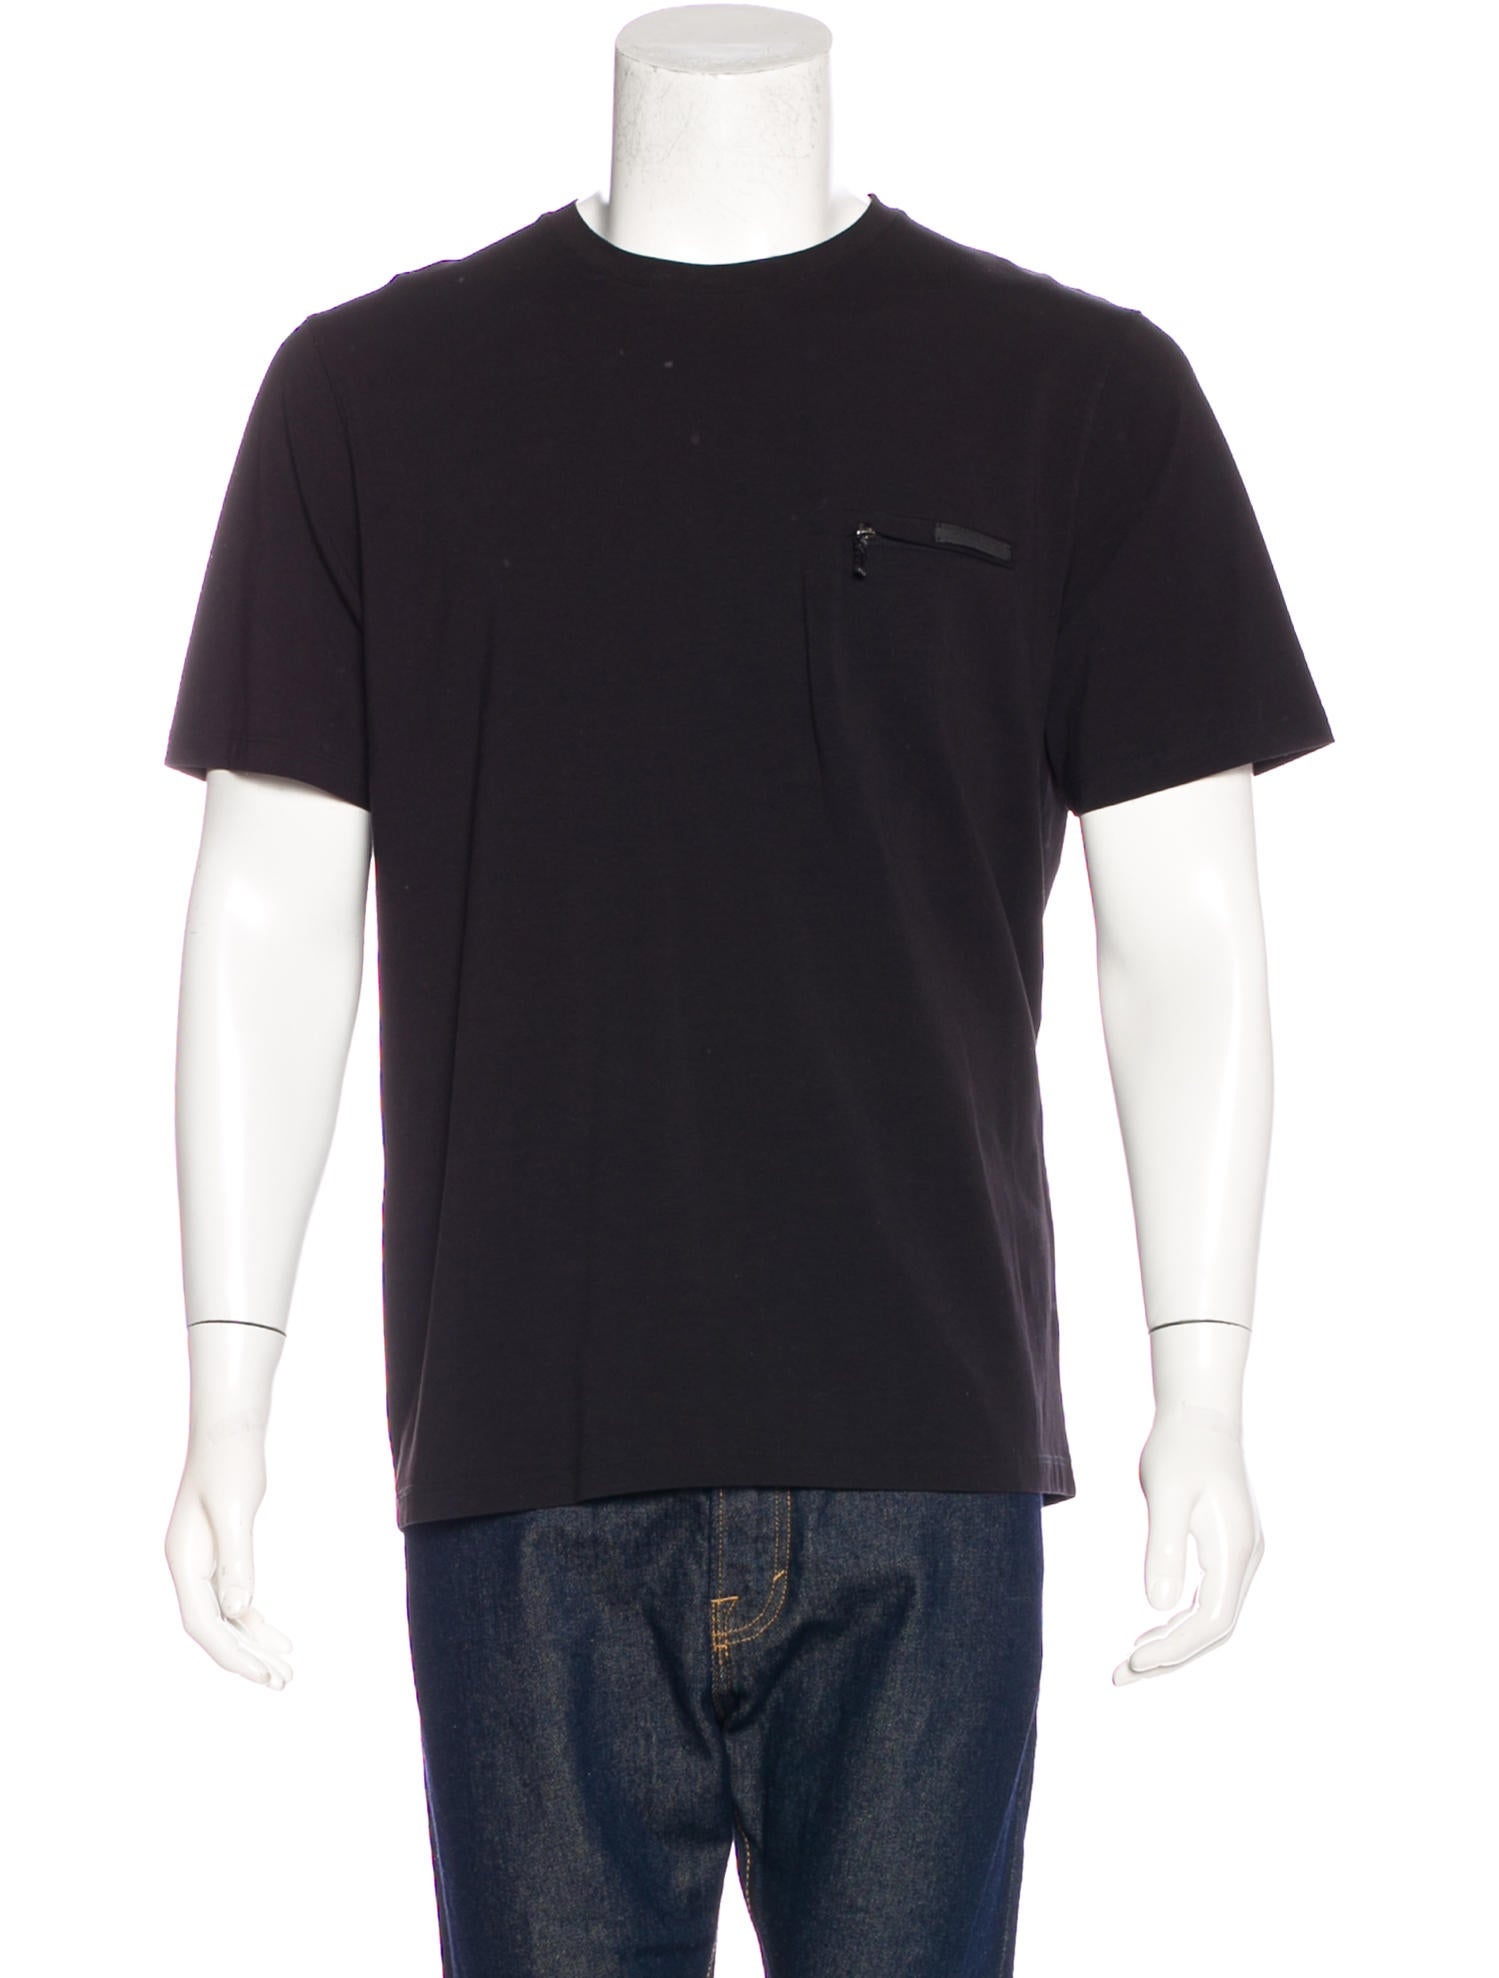 prada zipper pocket t shirt clothing pra168623 the